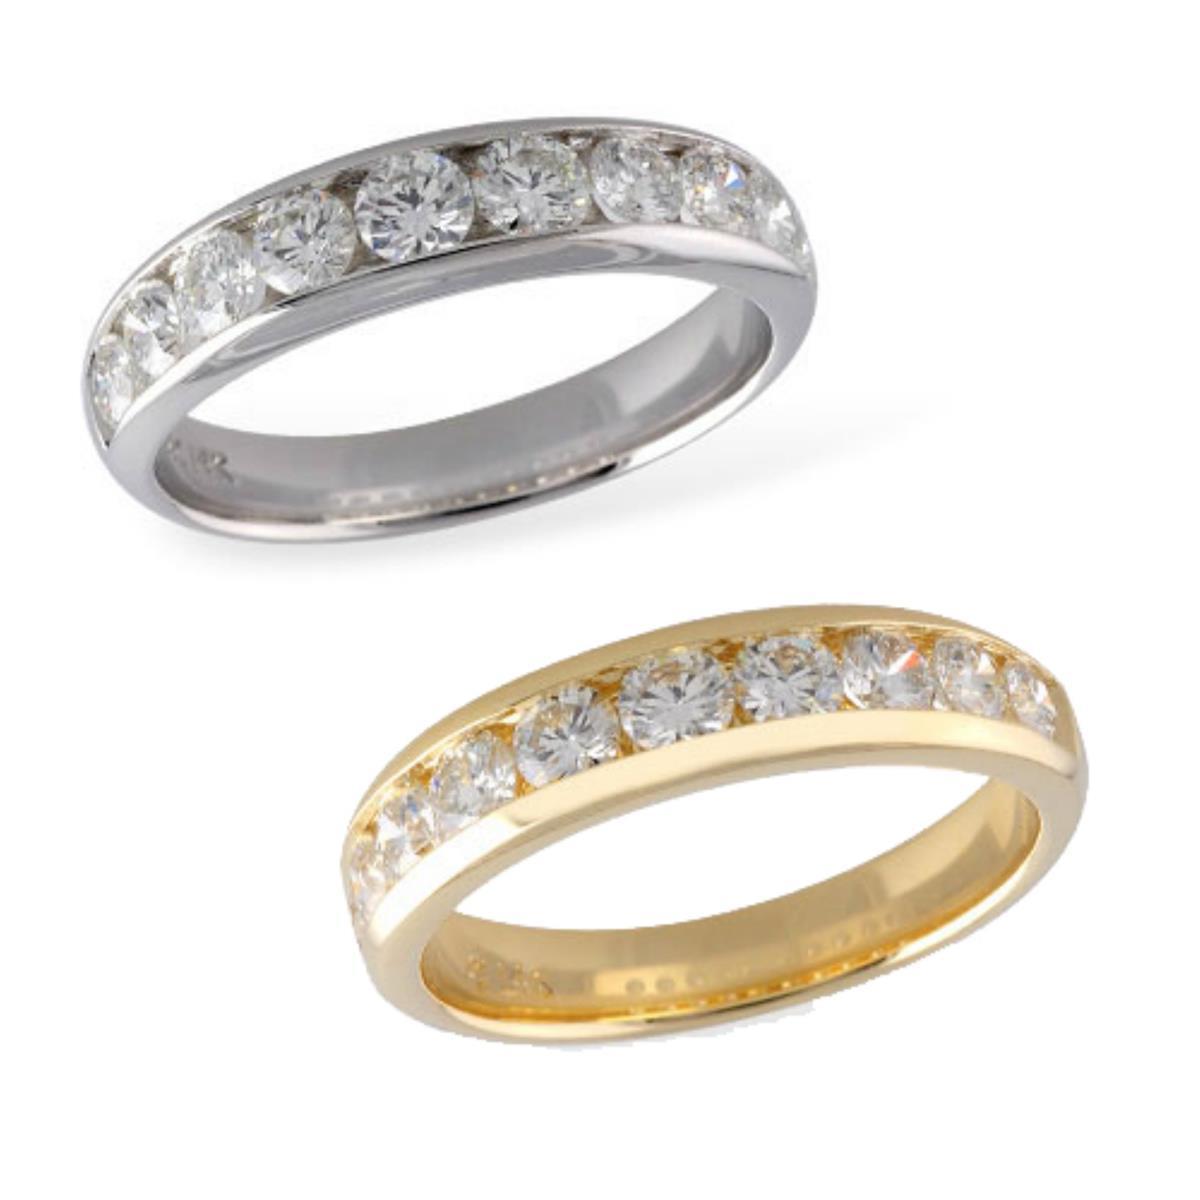 Channel_set_anniversary_band_yellow_white_gold_round_diamonds